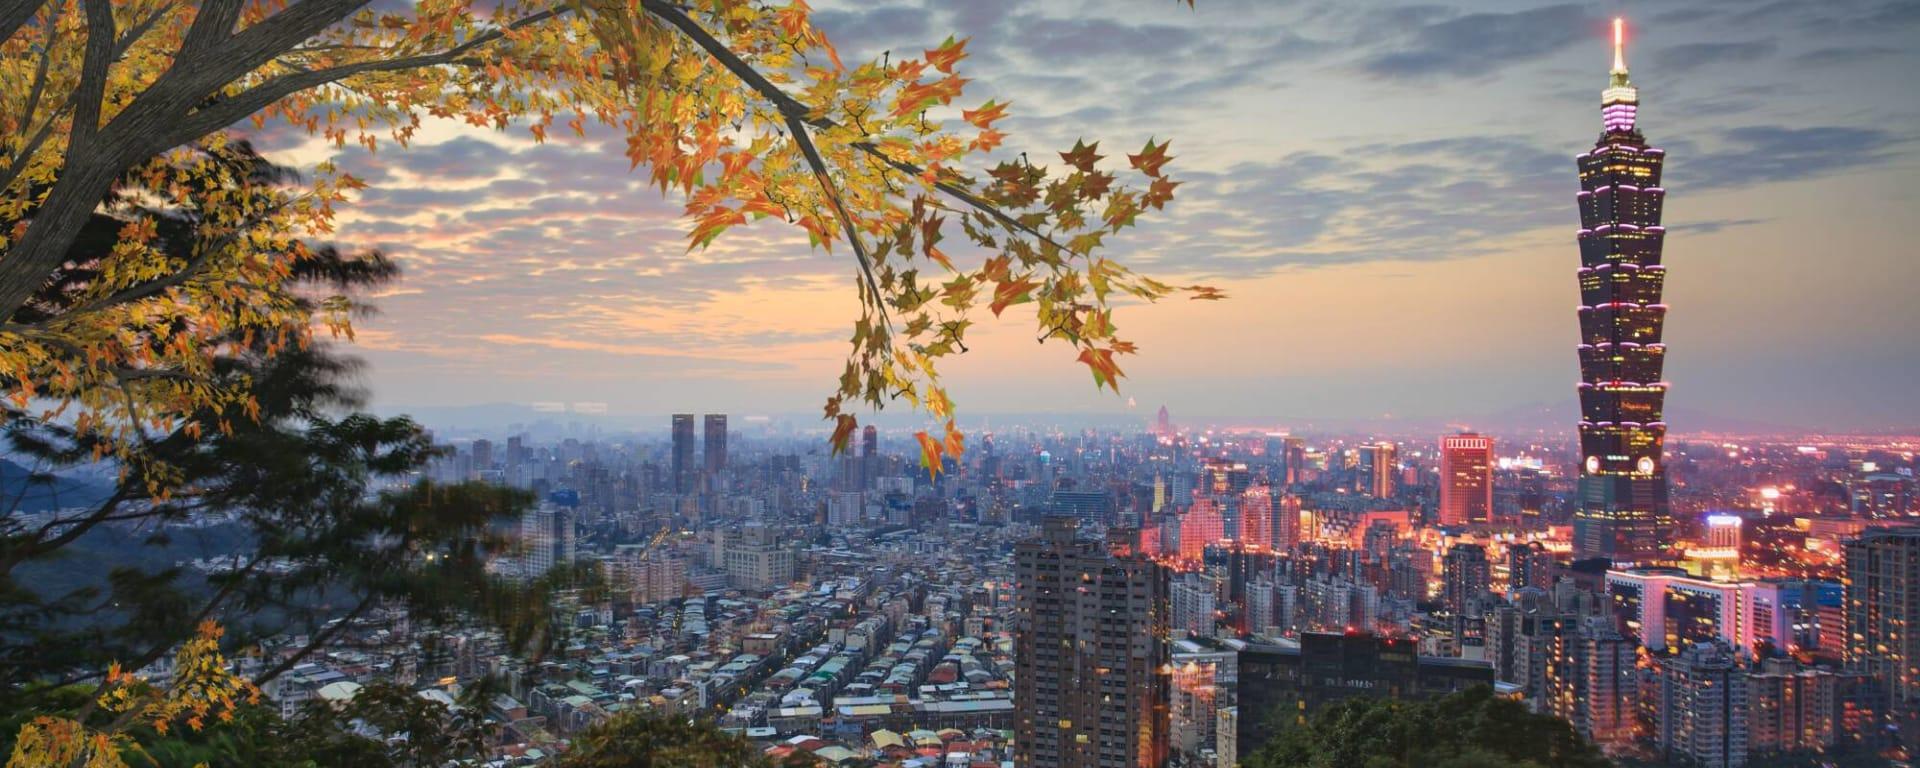 Taiwan entdecken mit Tischler Reisen: Taiwan Taipei Panorama